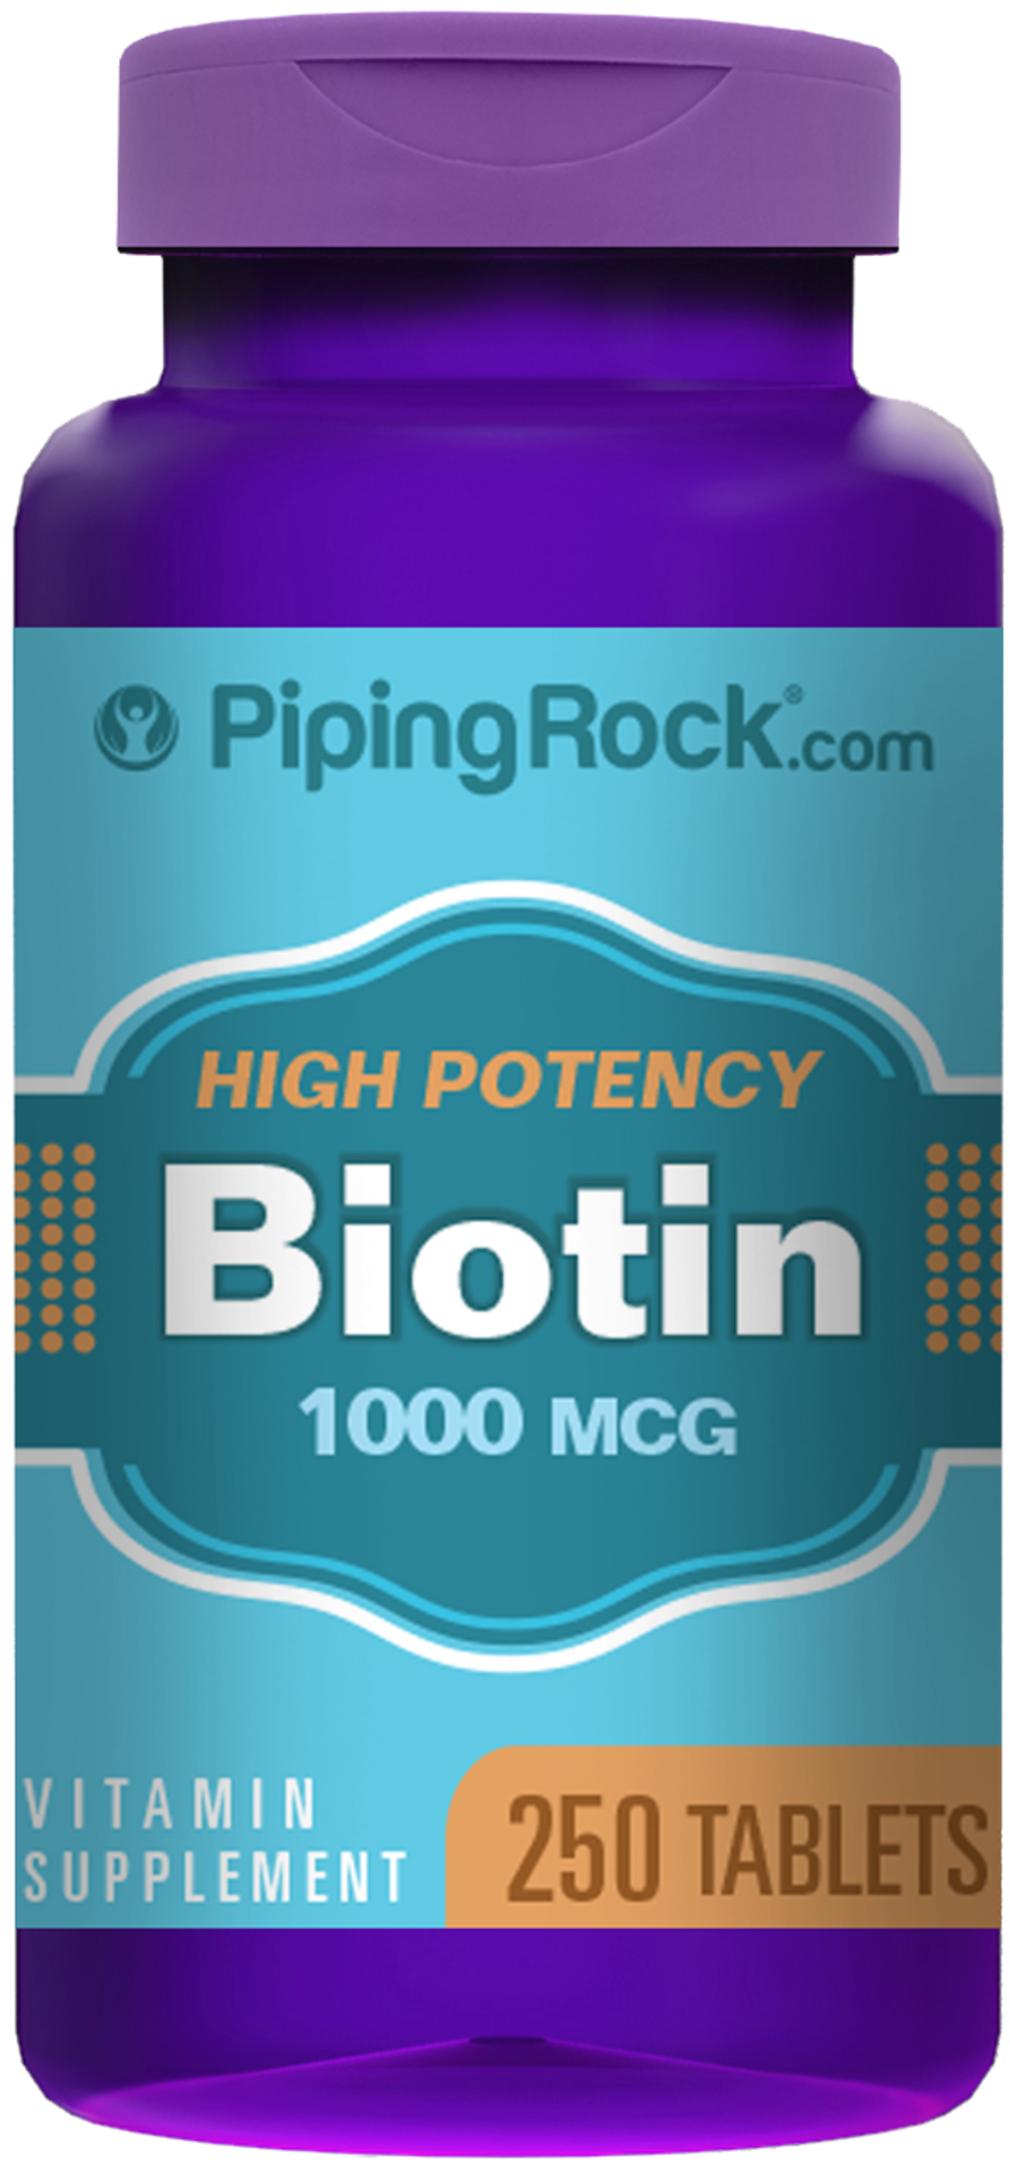 biotin-1000-mcg-1-mg-1243